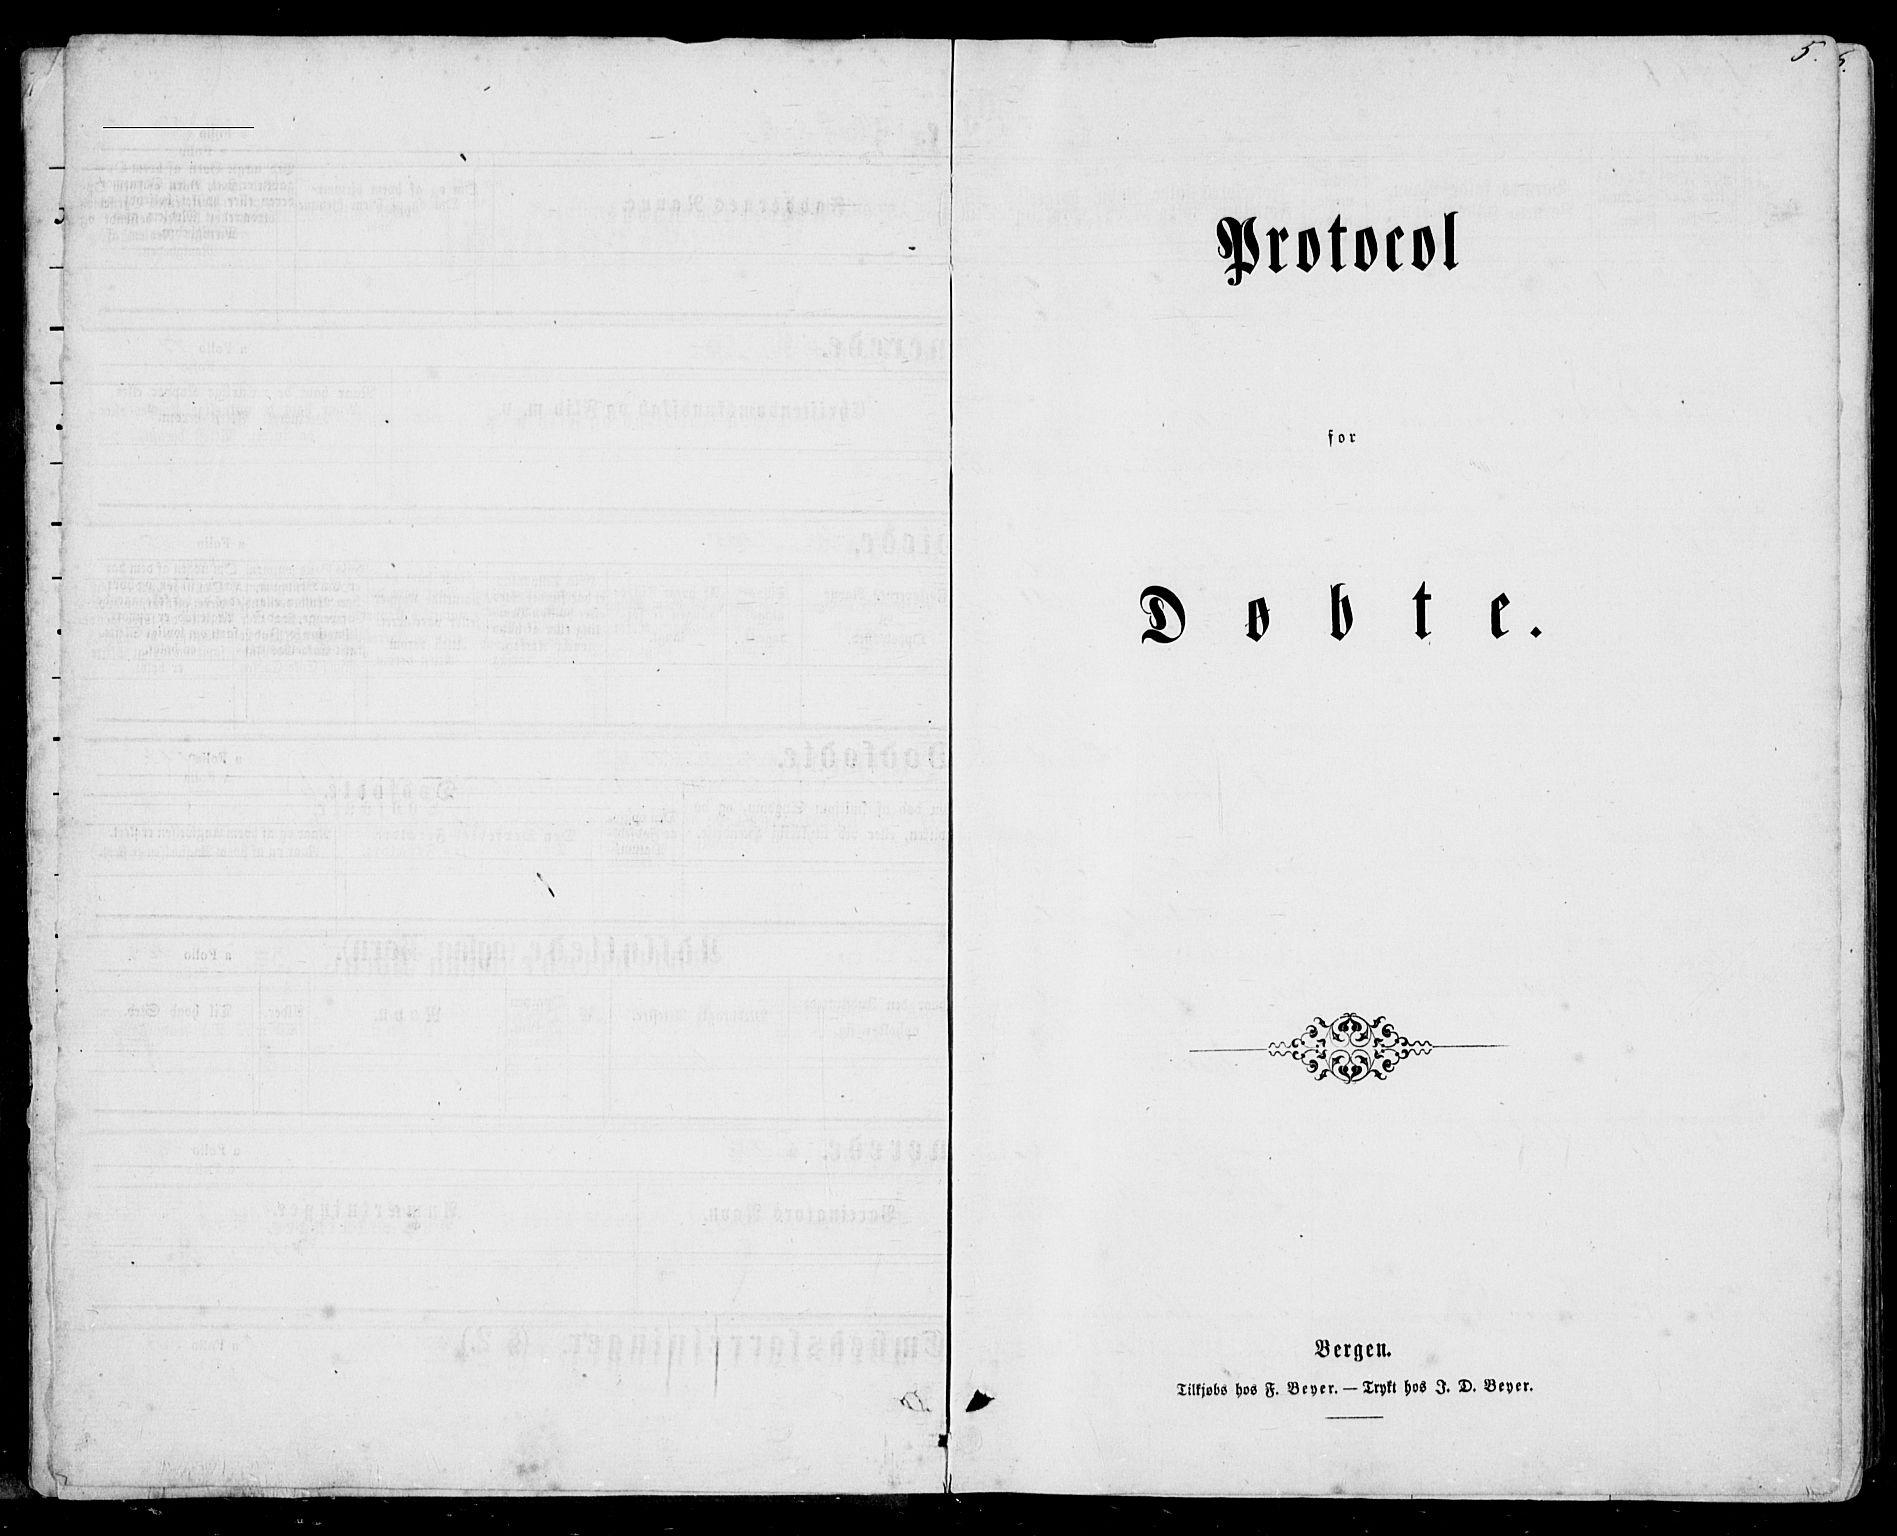 SAST, Nedstrand sokneprestkontor, IV: Ministerialbok nr. A 9, 1861-1876, s. 5